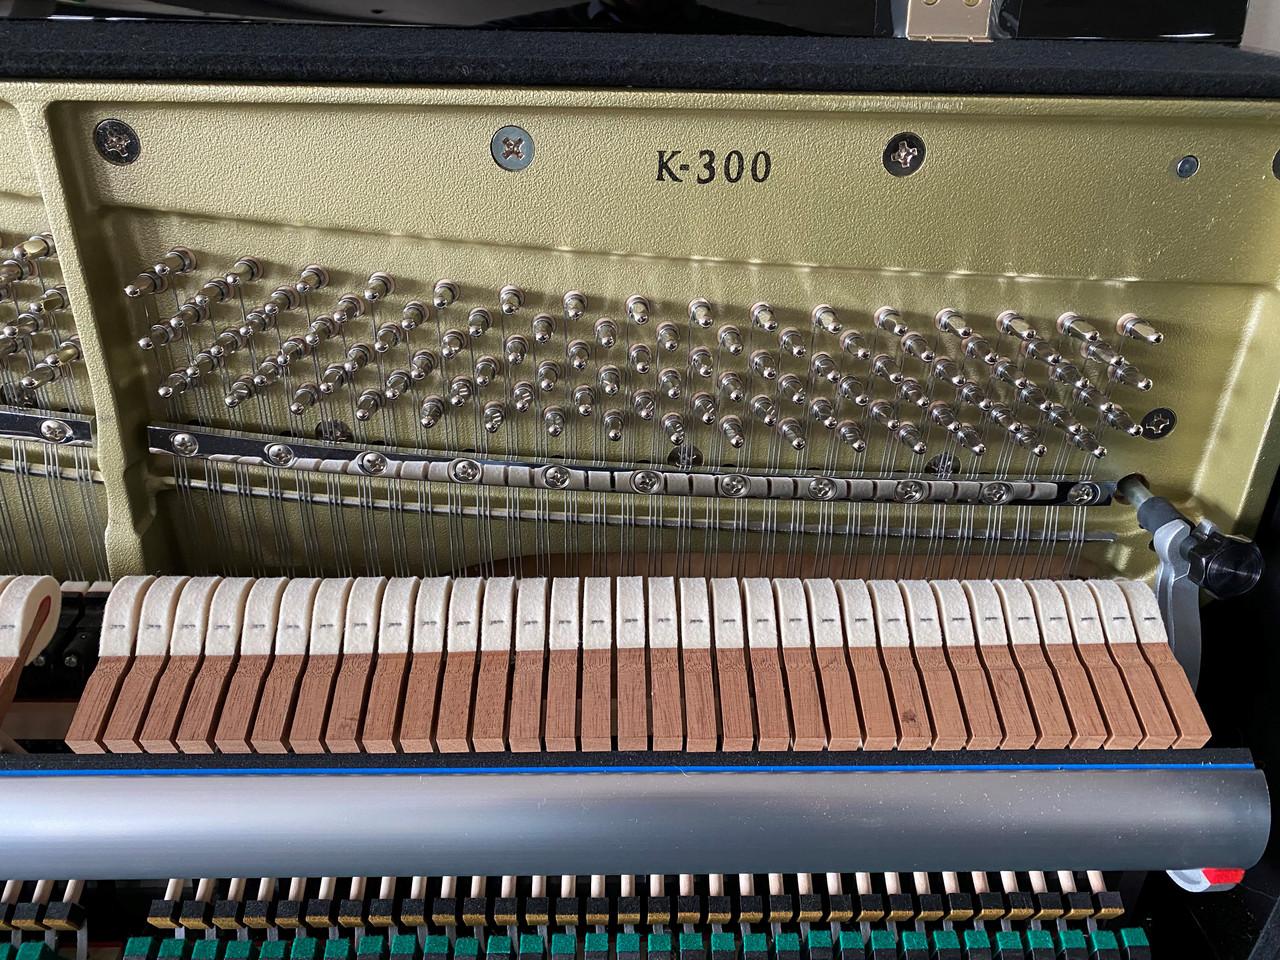 Genuine Kawai K300 Production